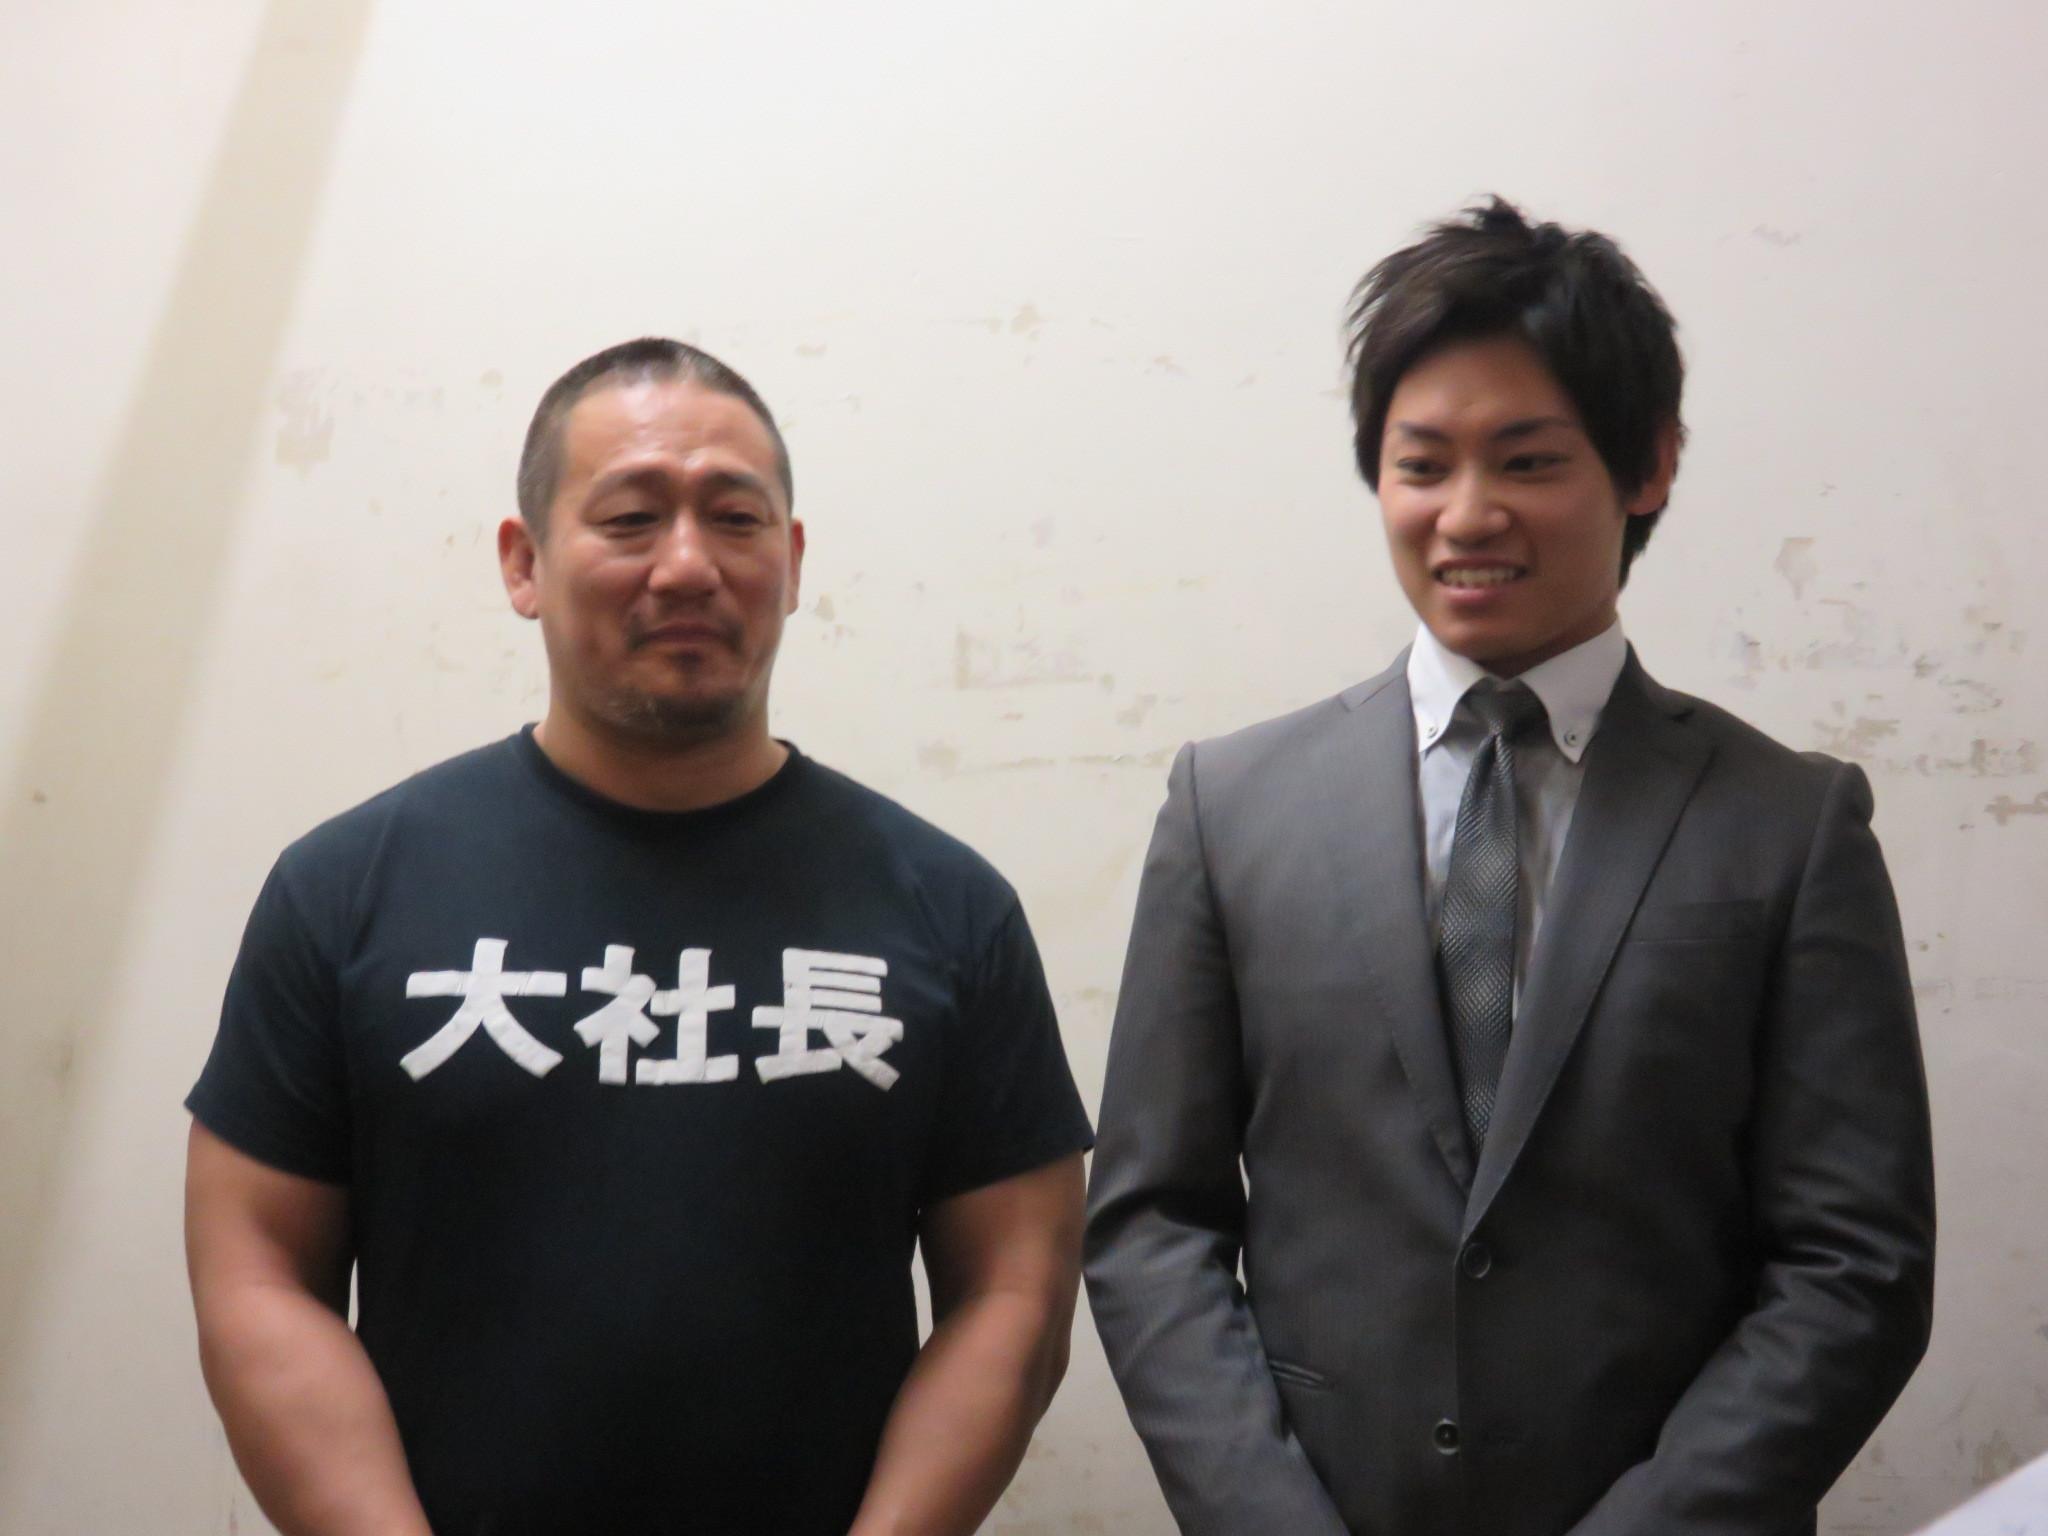 http://news.yoshimoto.co.jp/photos/uncategorized/2015/05/31/20150531173557-167818cdb6f27b4b97ebc10cf7bc68cb594ba291.jpg